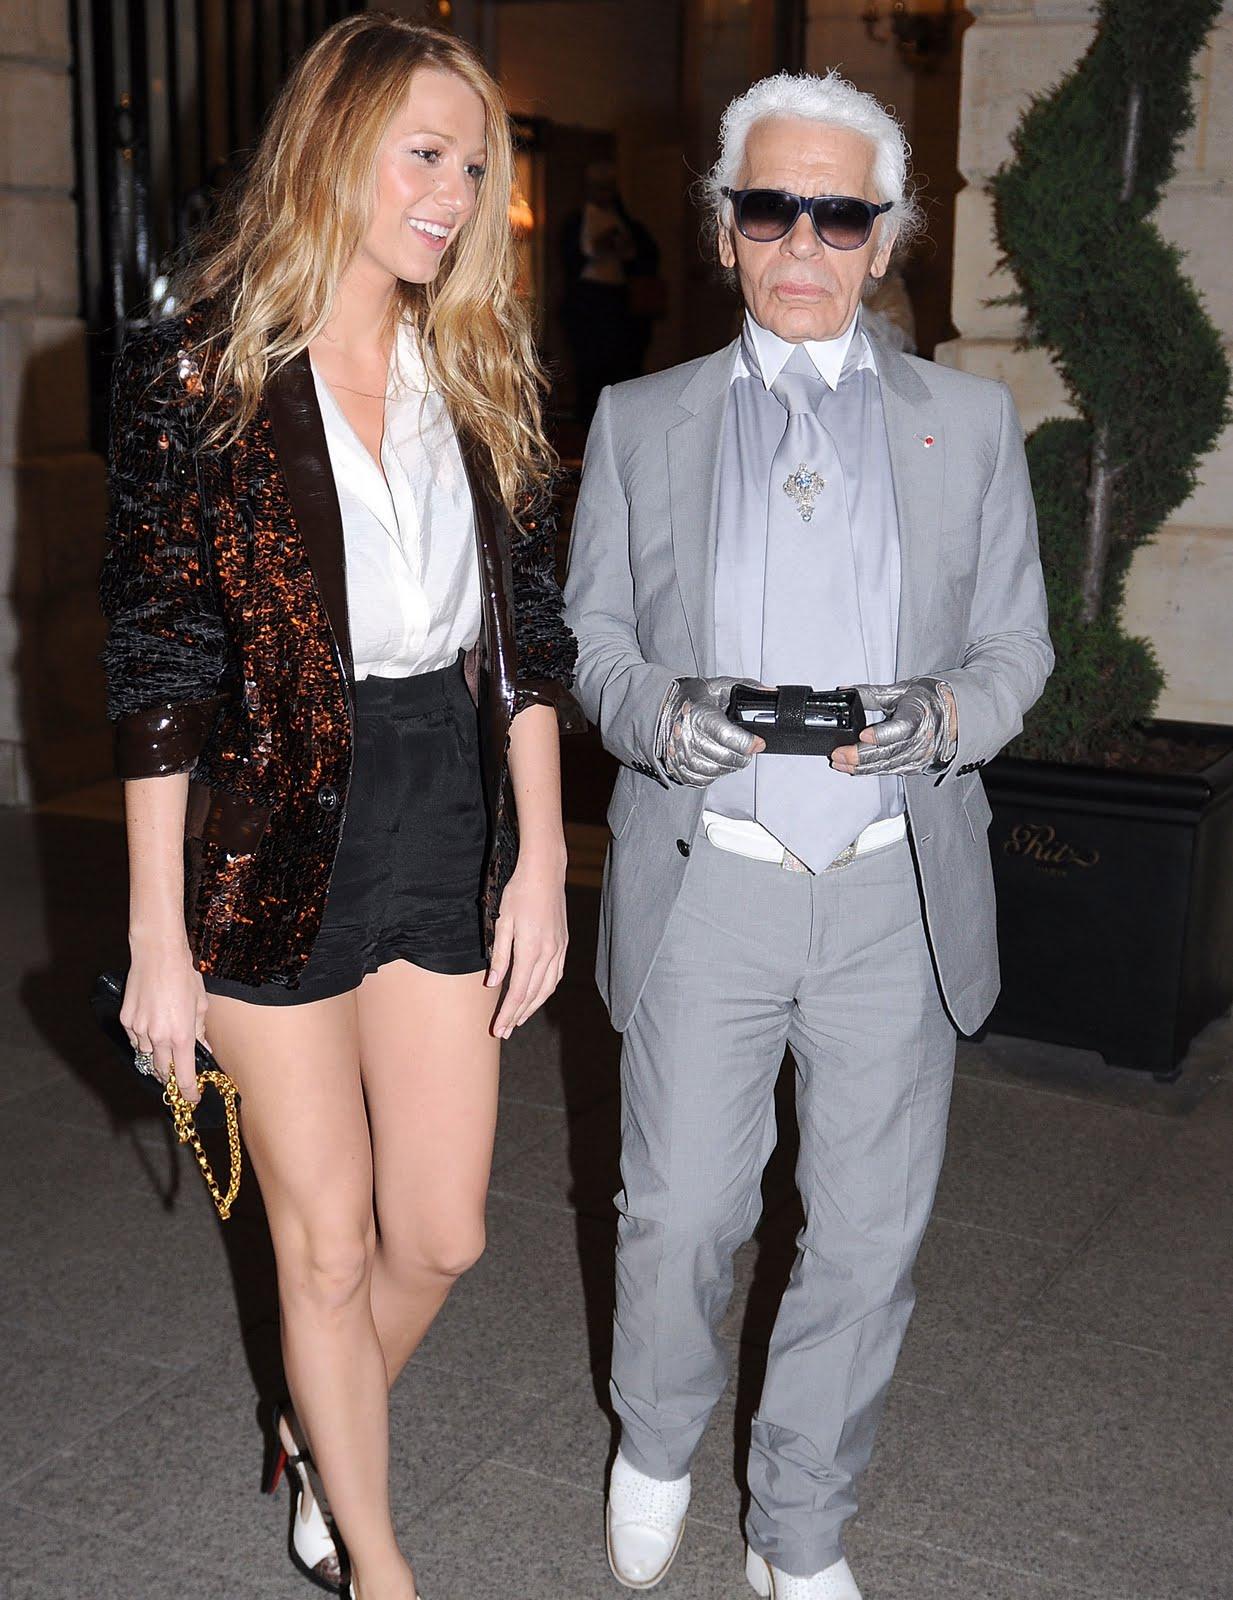 Style Spotlight: Blake Lively